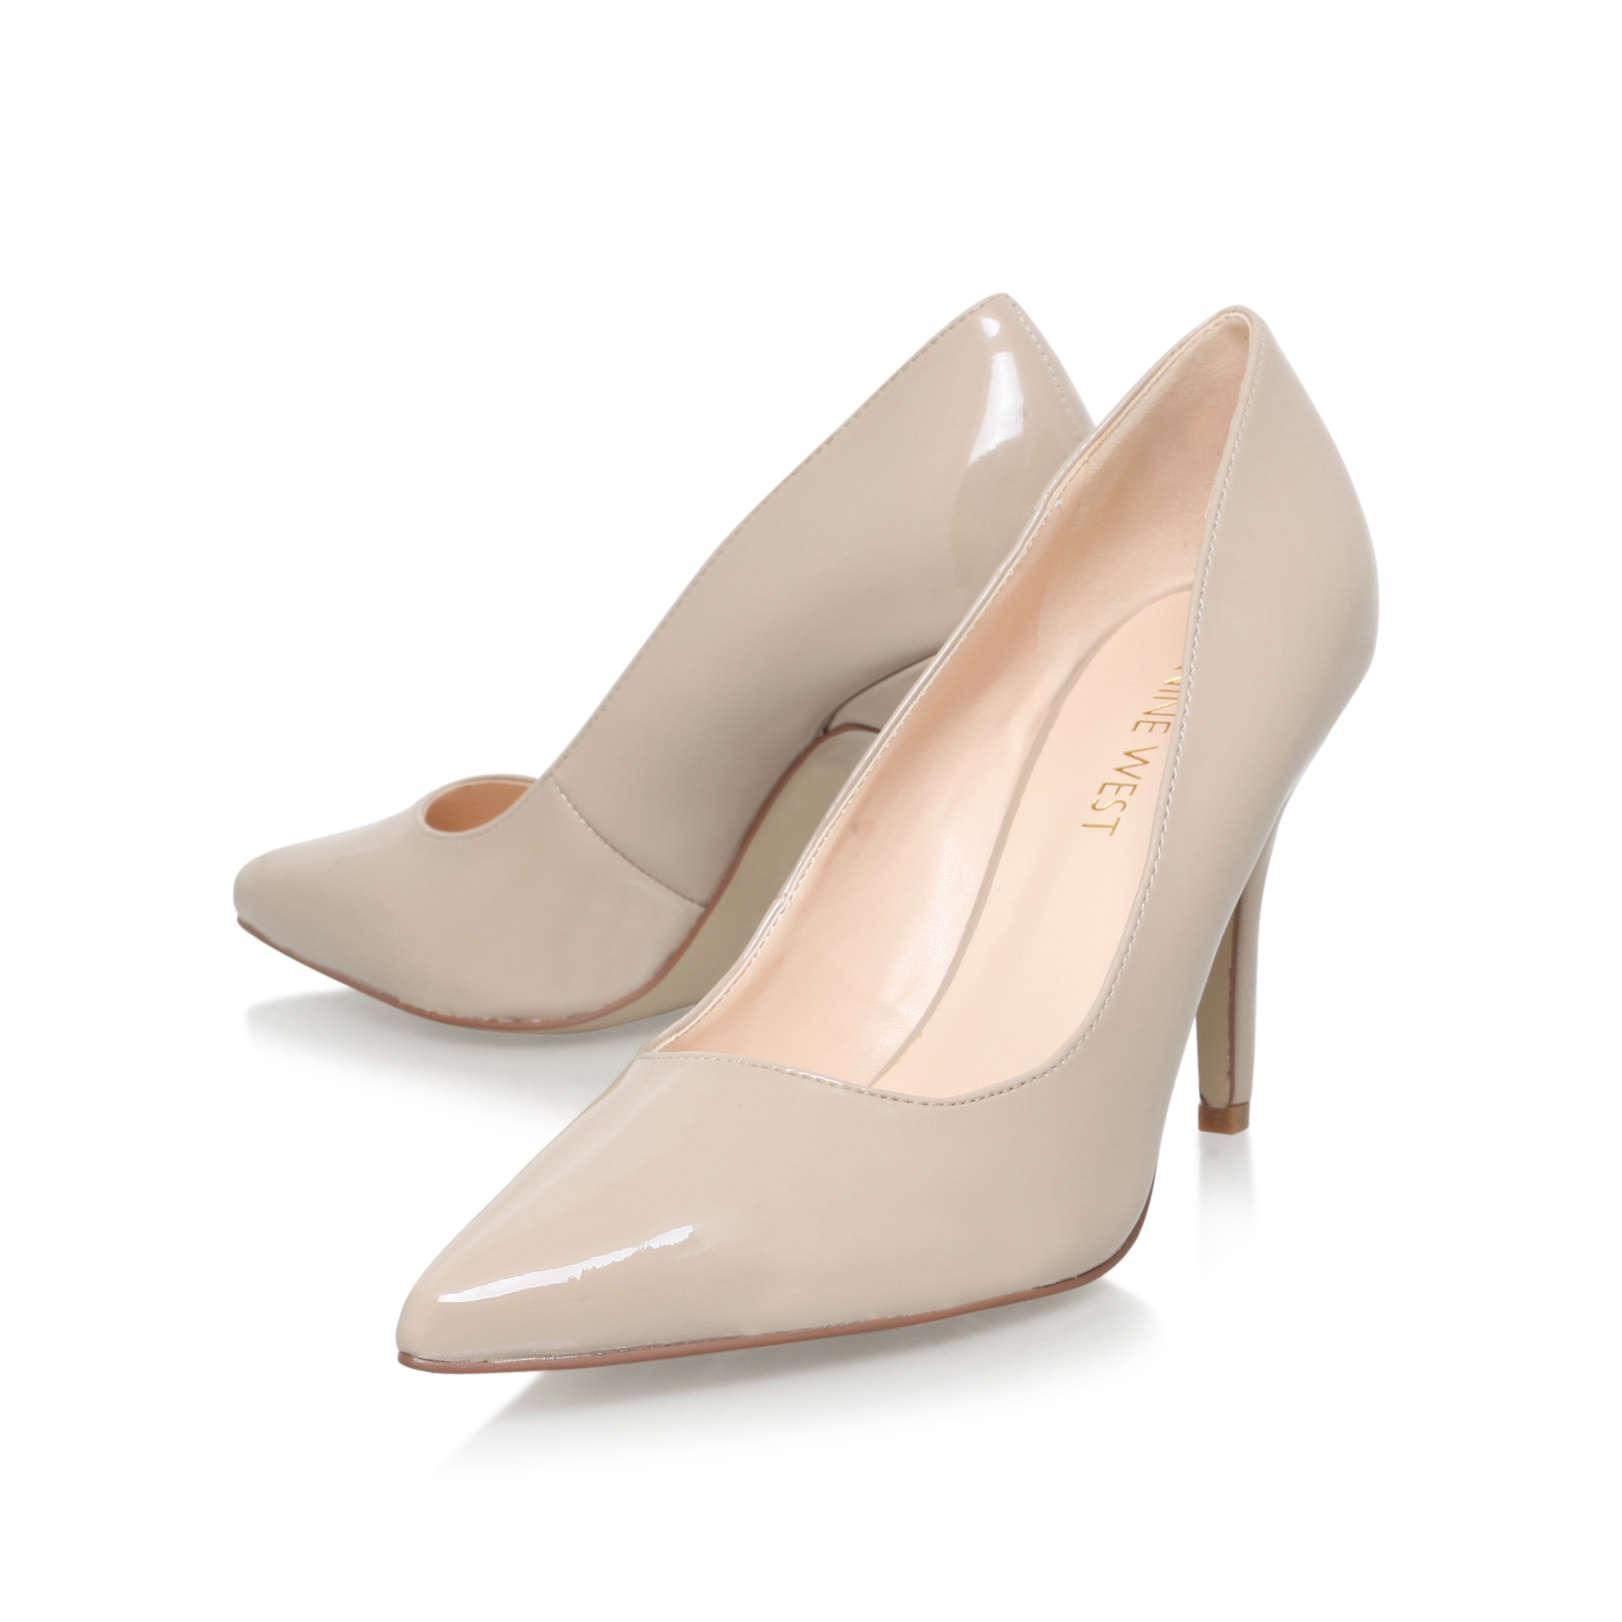 4ada0e645de FLAGSHIP Nine West Flagship Nude Patent High Heel Court Shoes by ...